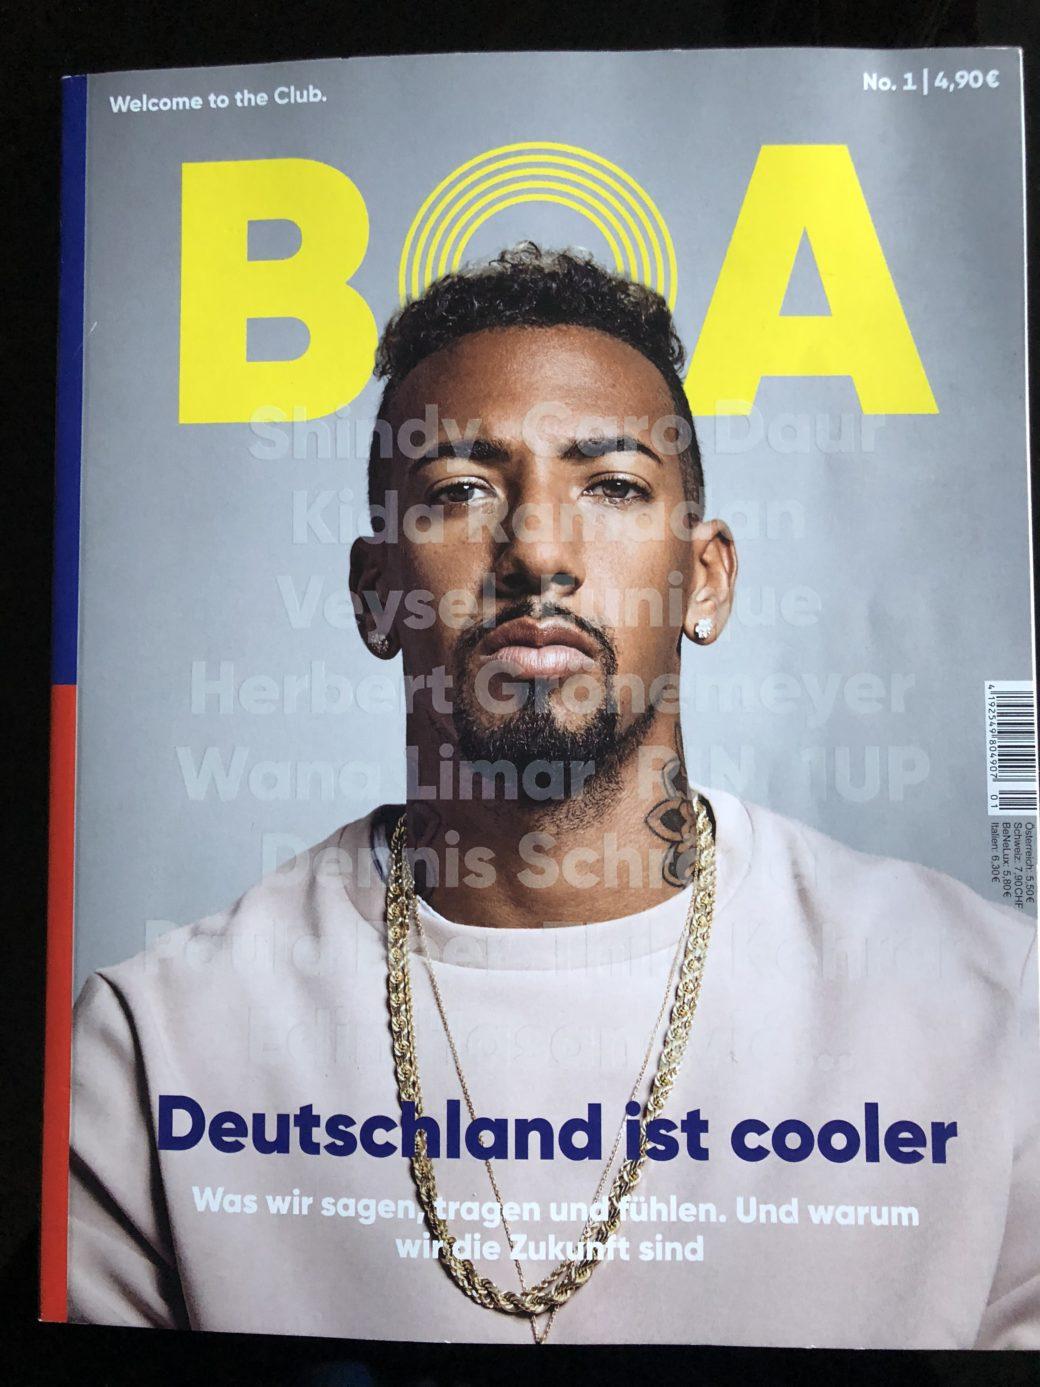 Boa Hier Kommt Das Magazin Von Jerome Boateng Glam O Meter